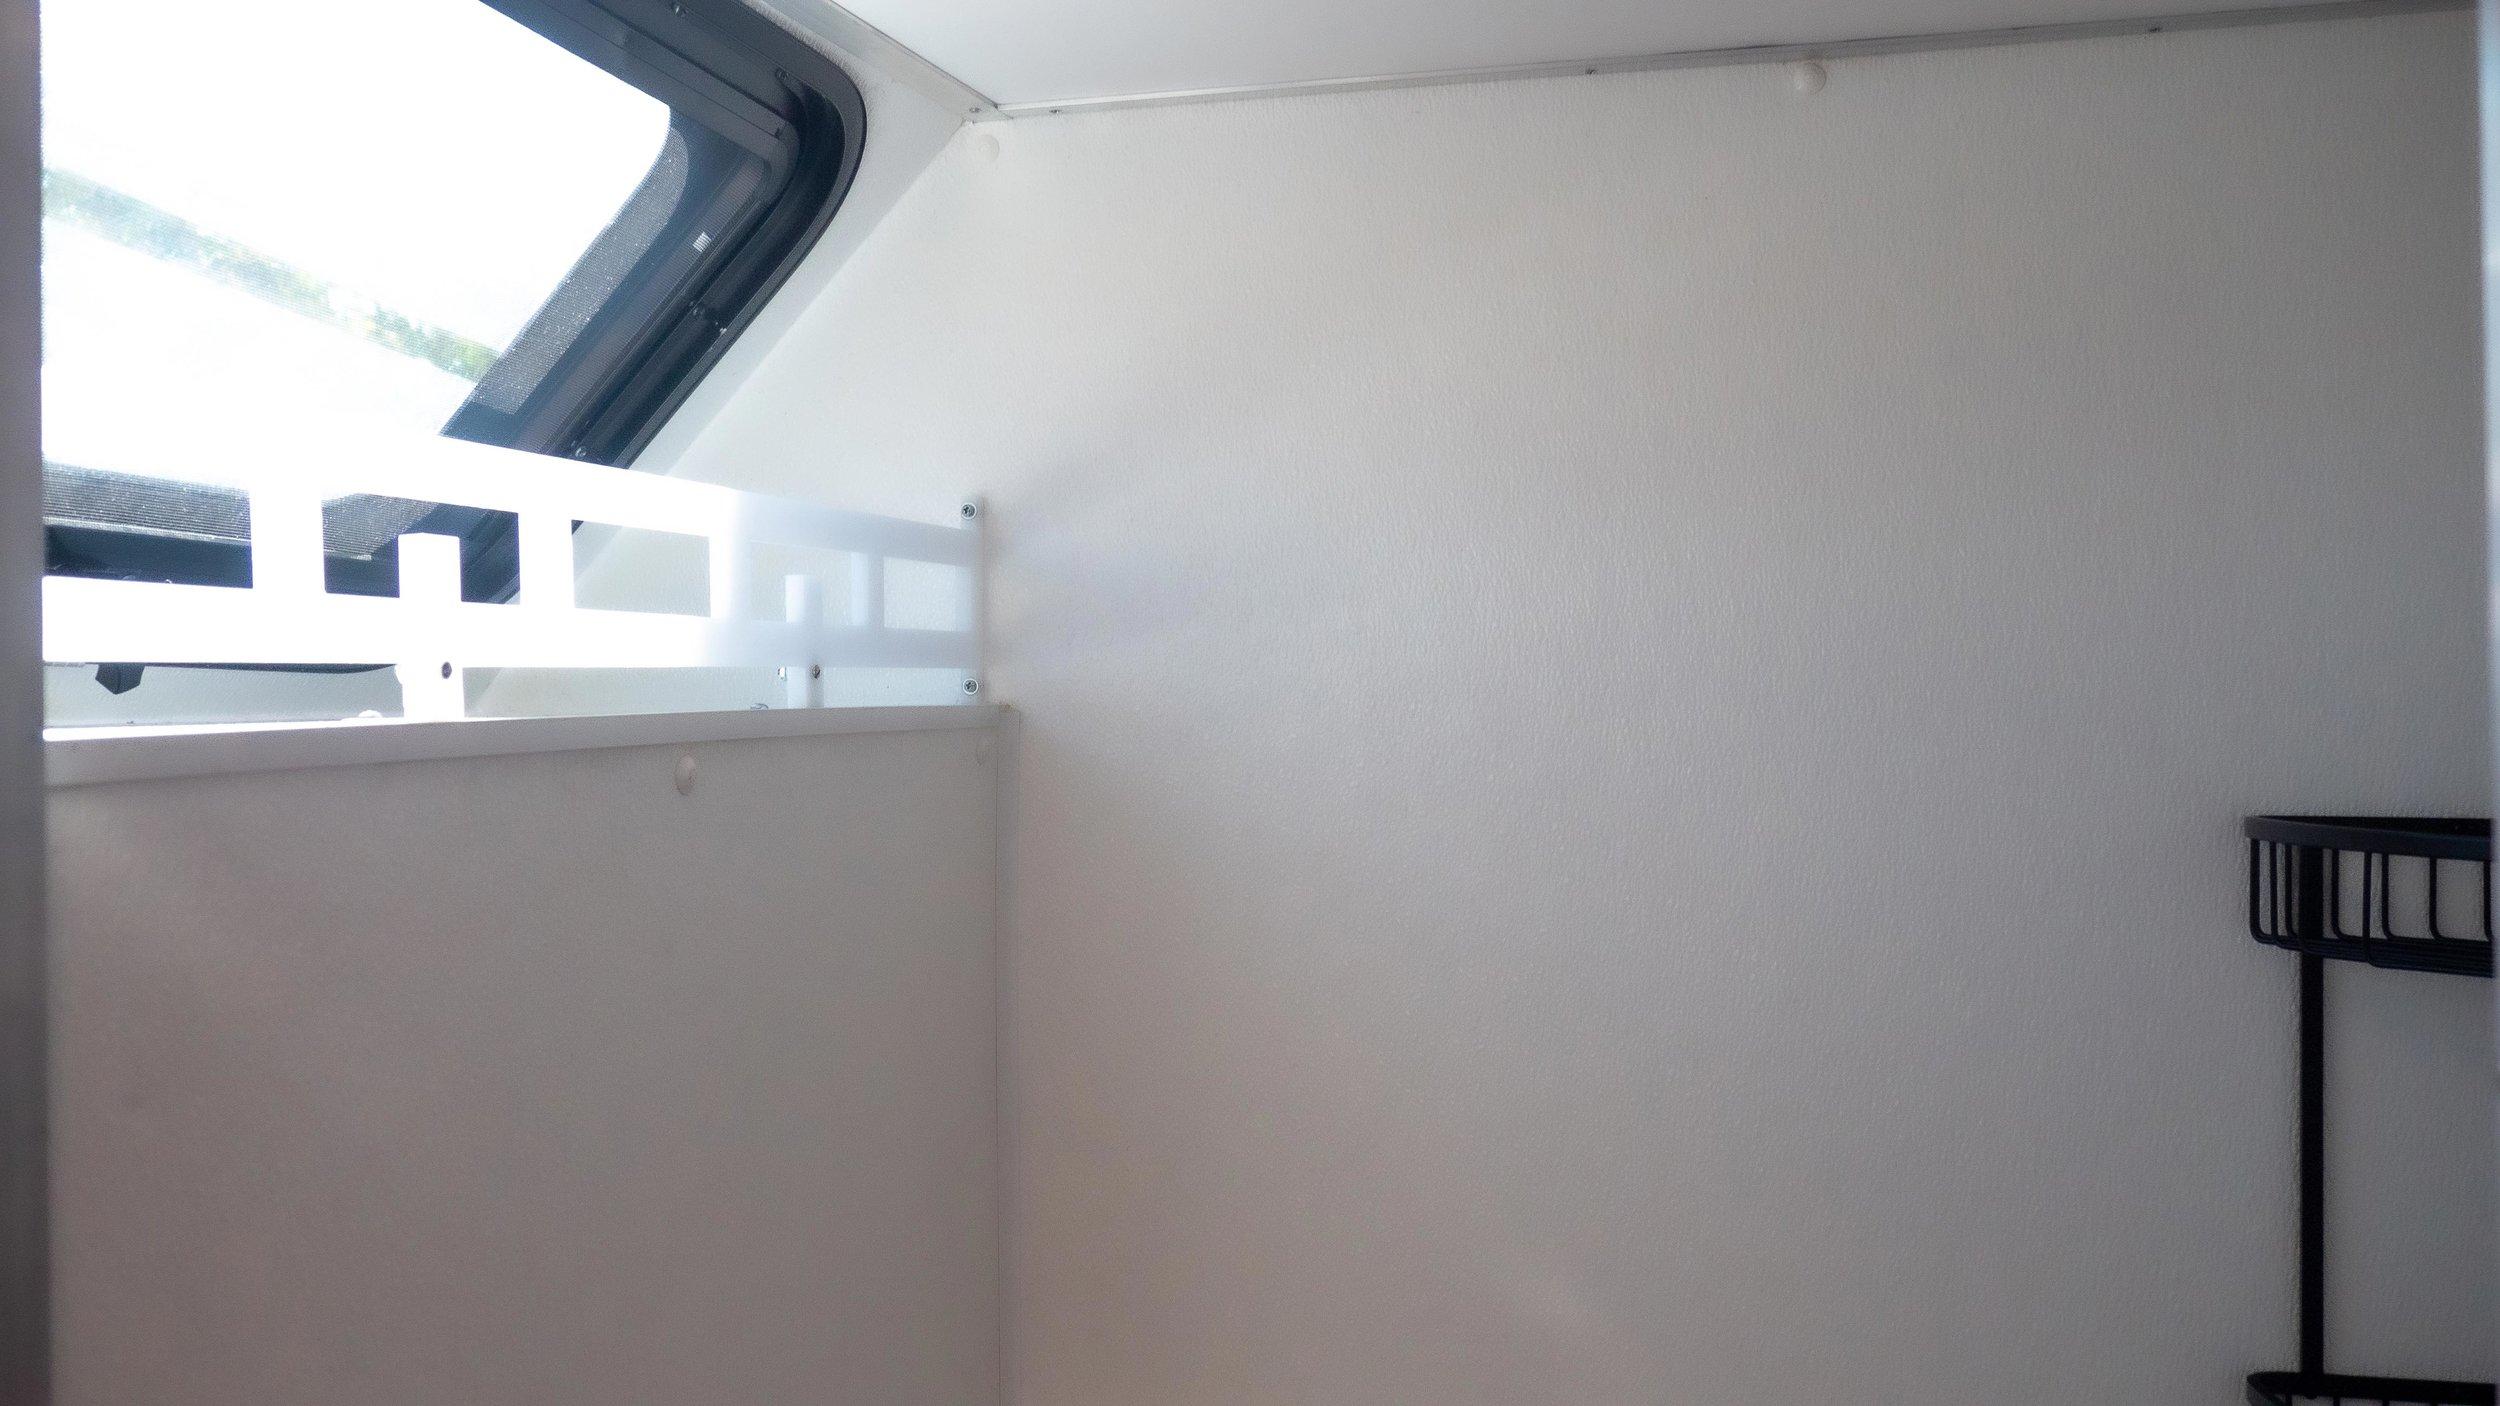 shower with storage rail and window